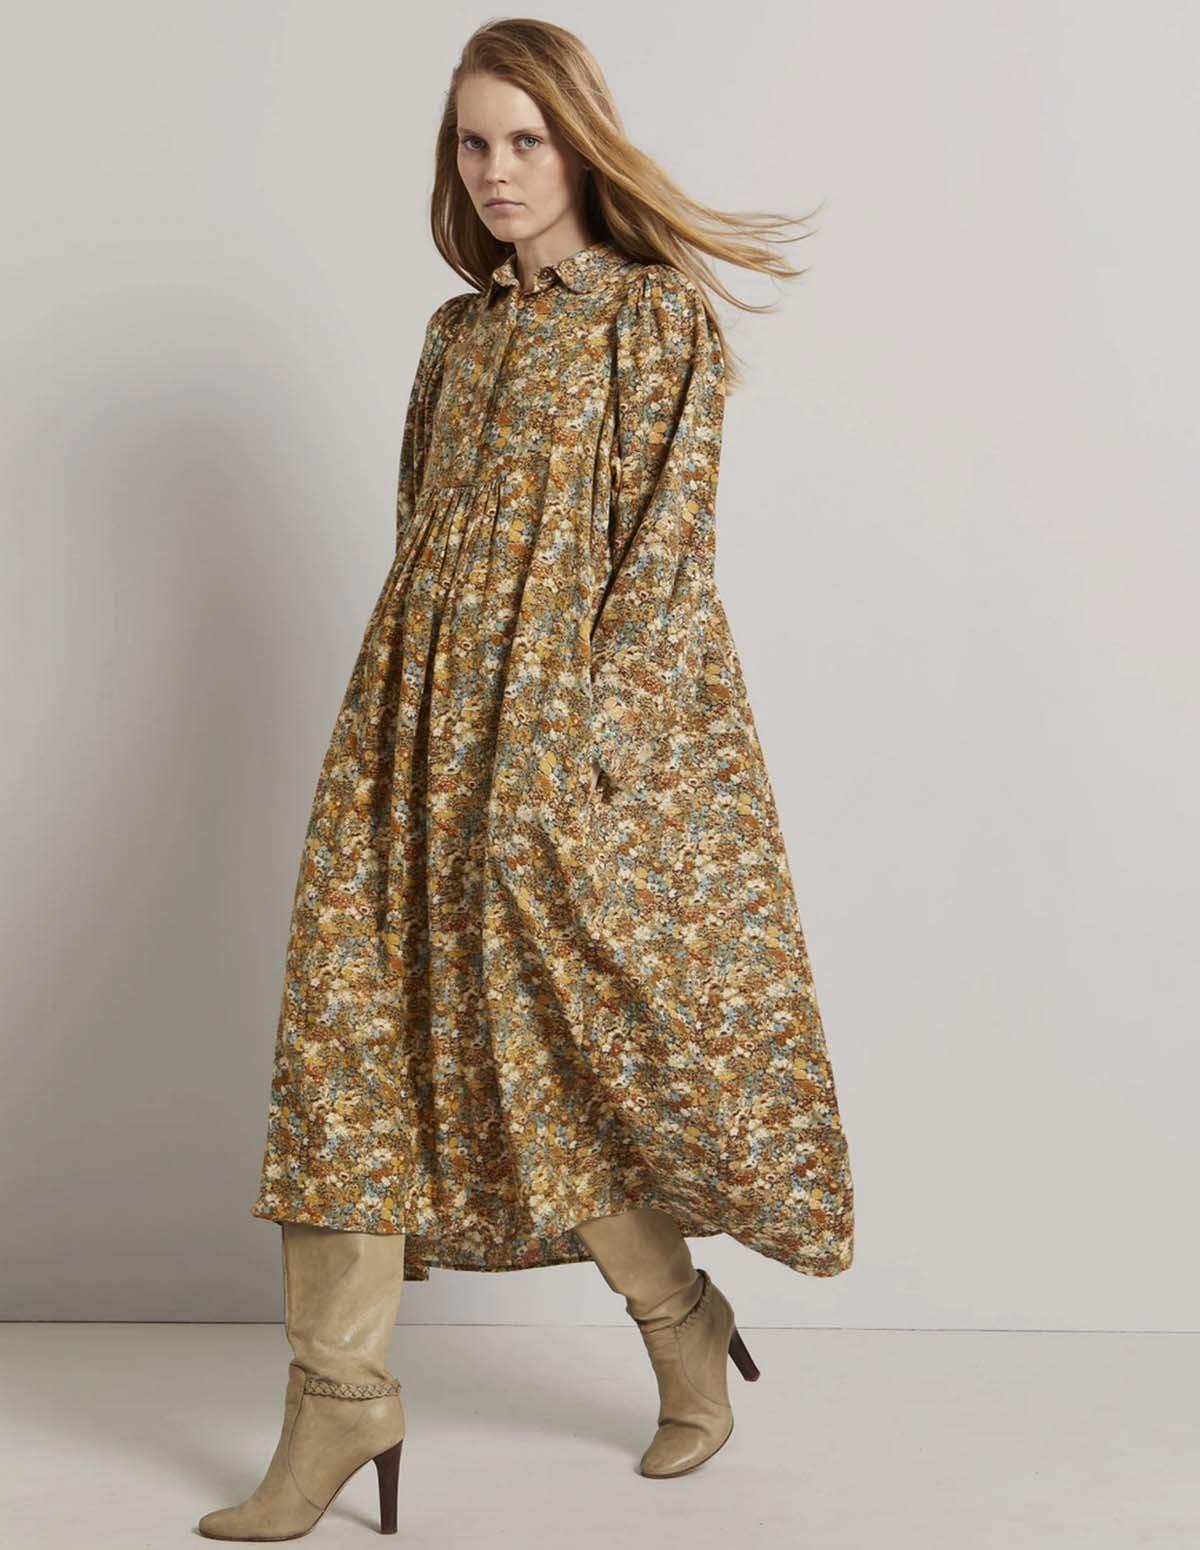 Lb Heart Dress - BROWN FLORAL